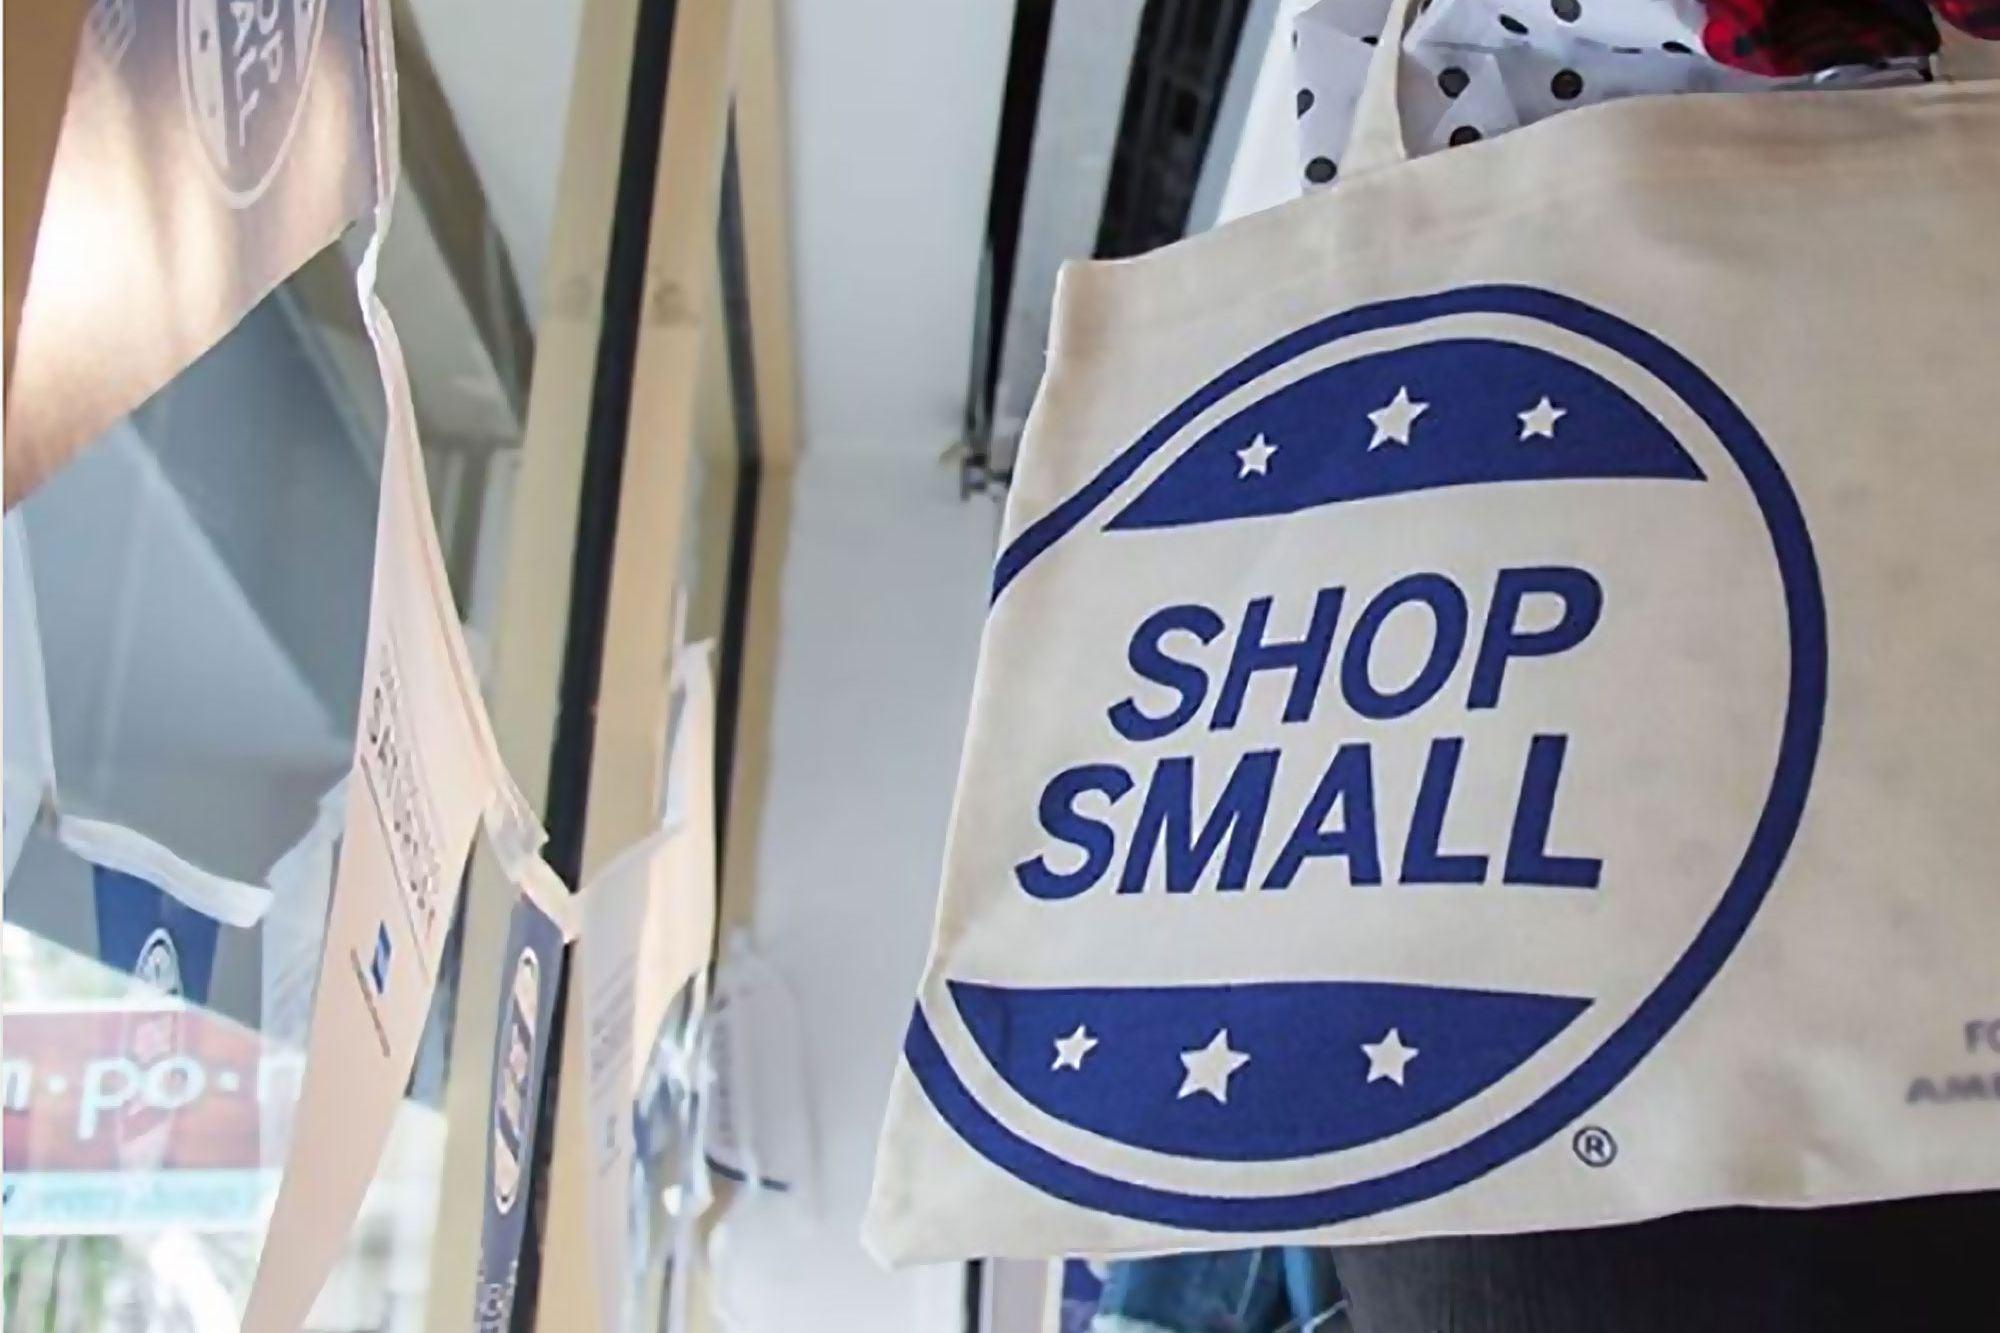 , 5 Last-Minute Ideas for a Successful Small Business Saturday, Saubio Making Wealth